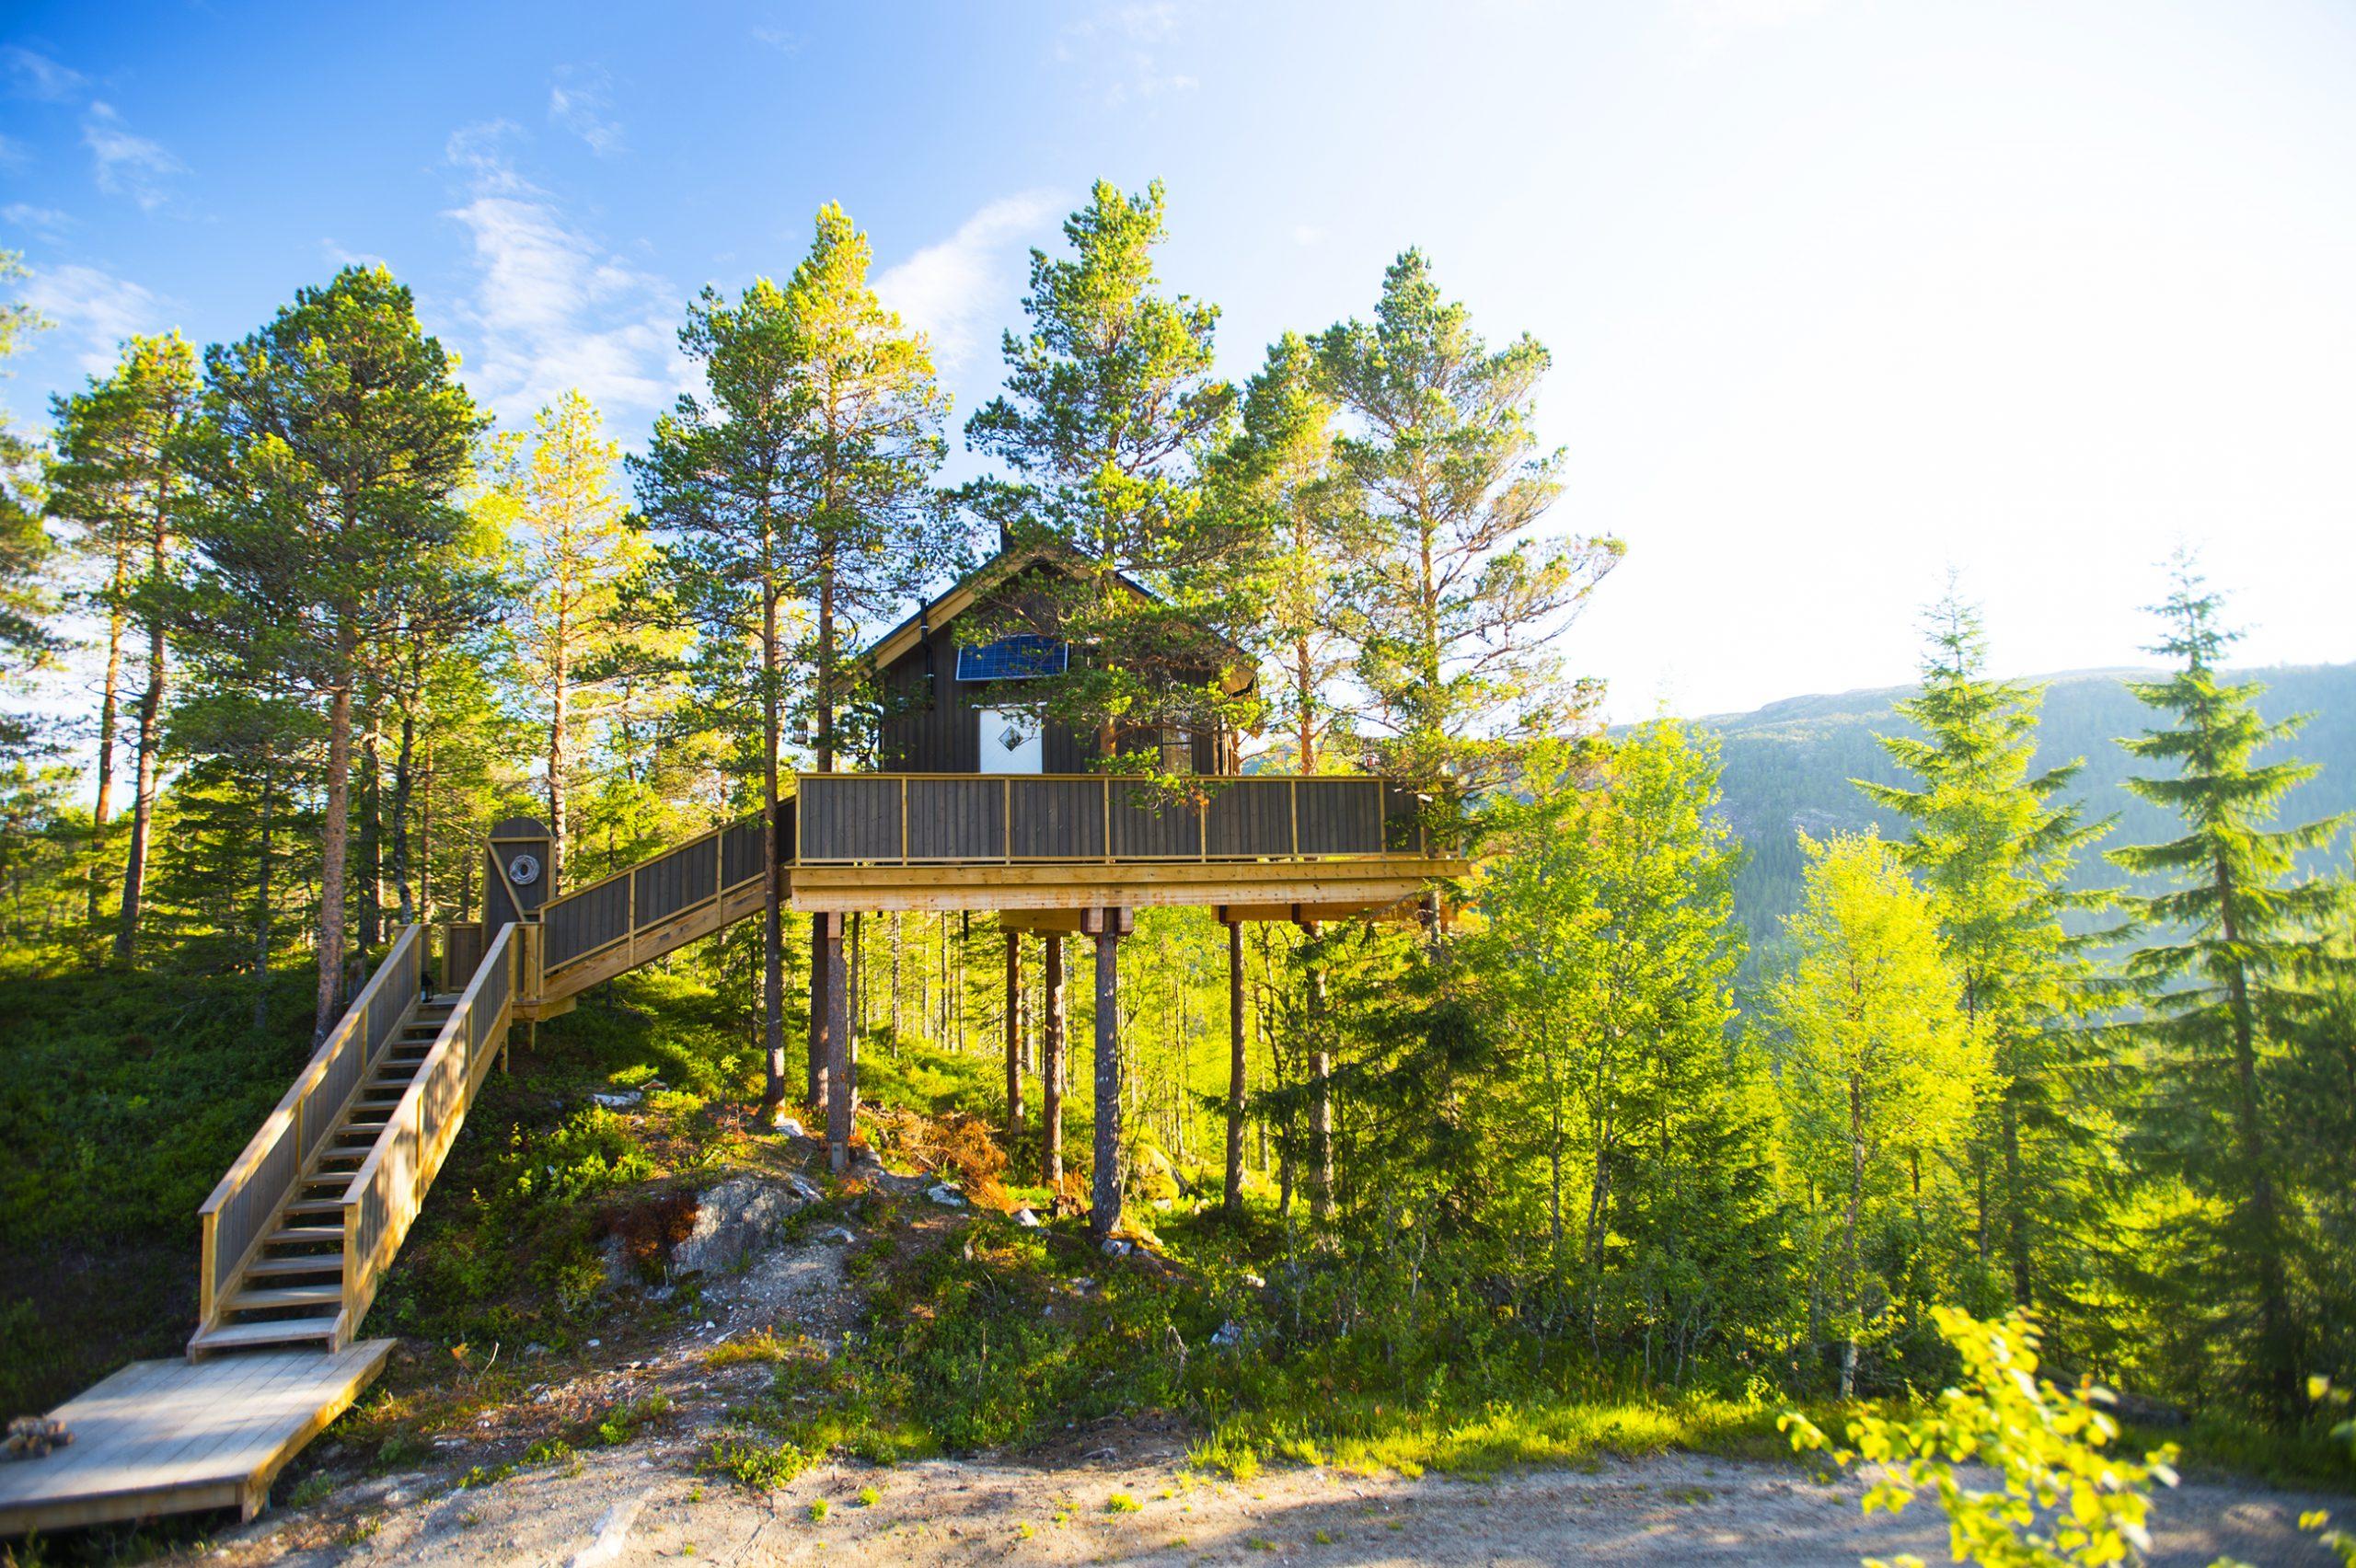 Unique Accommodation, Trettop cabin. Photo: Olav Breen/ Kystriksveien